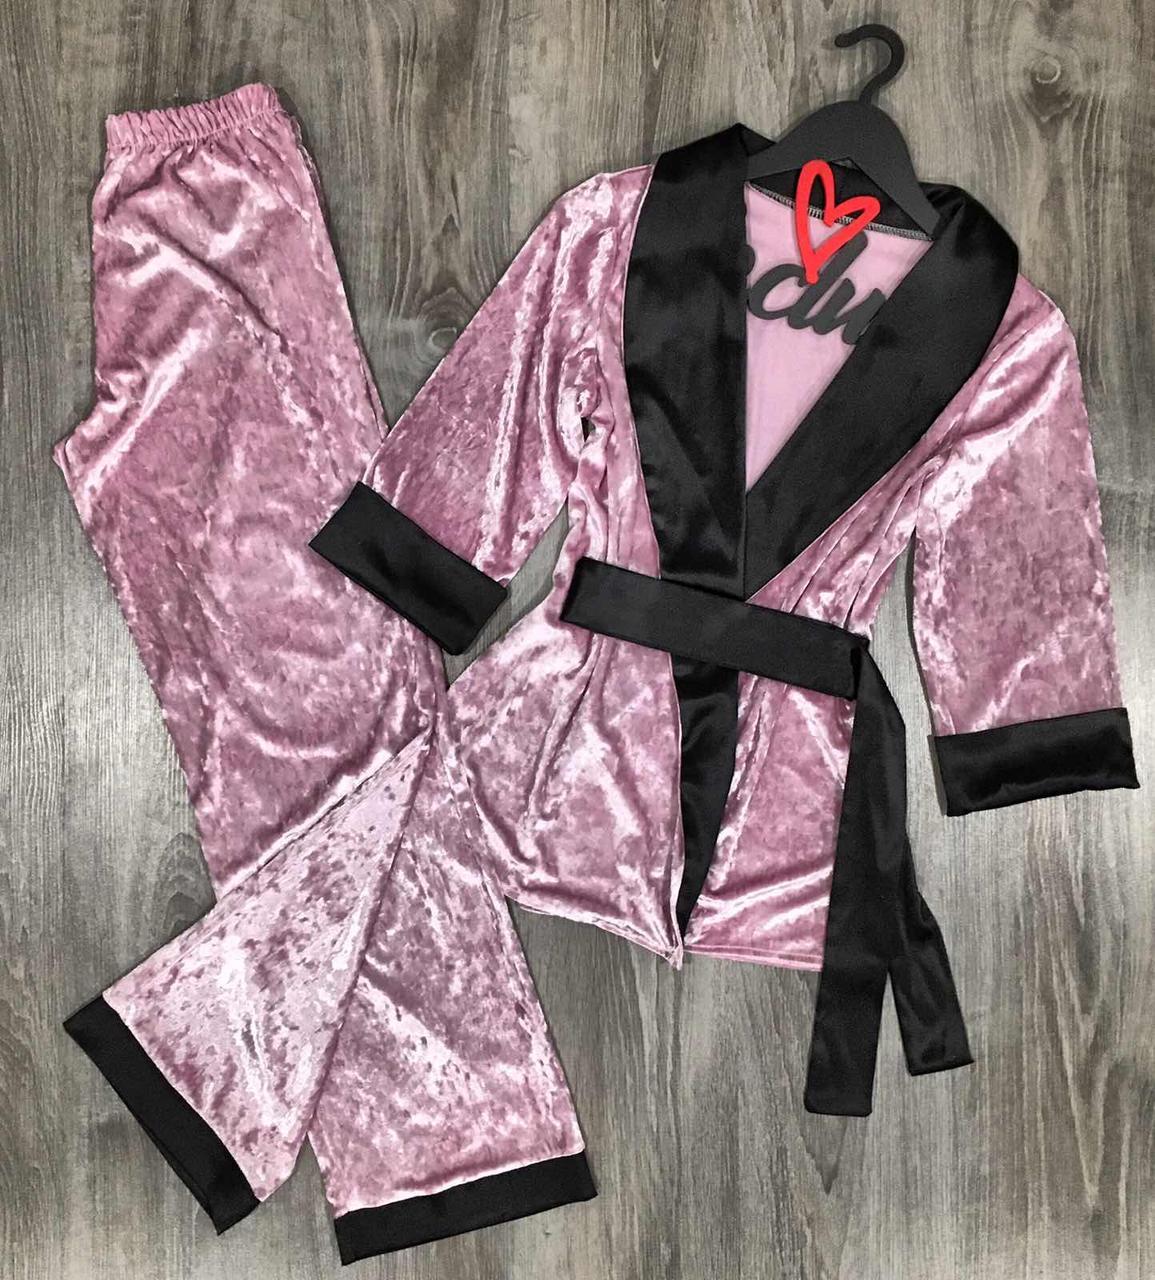 046_1_pink.jpg